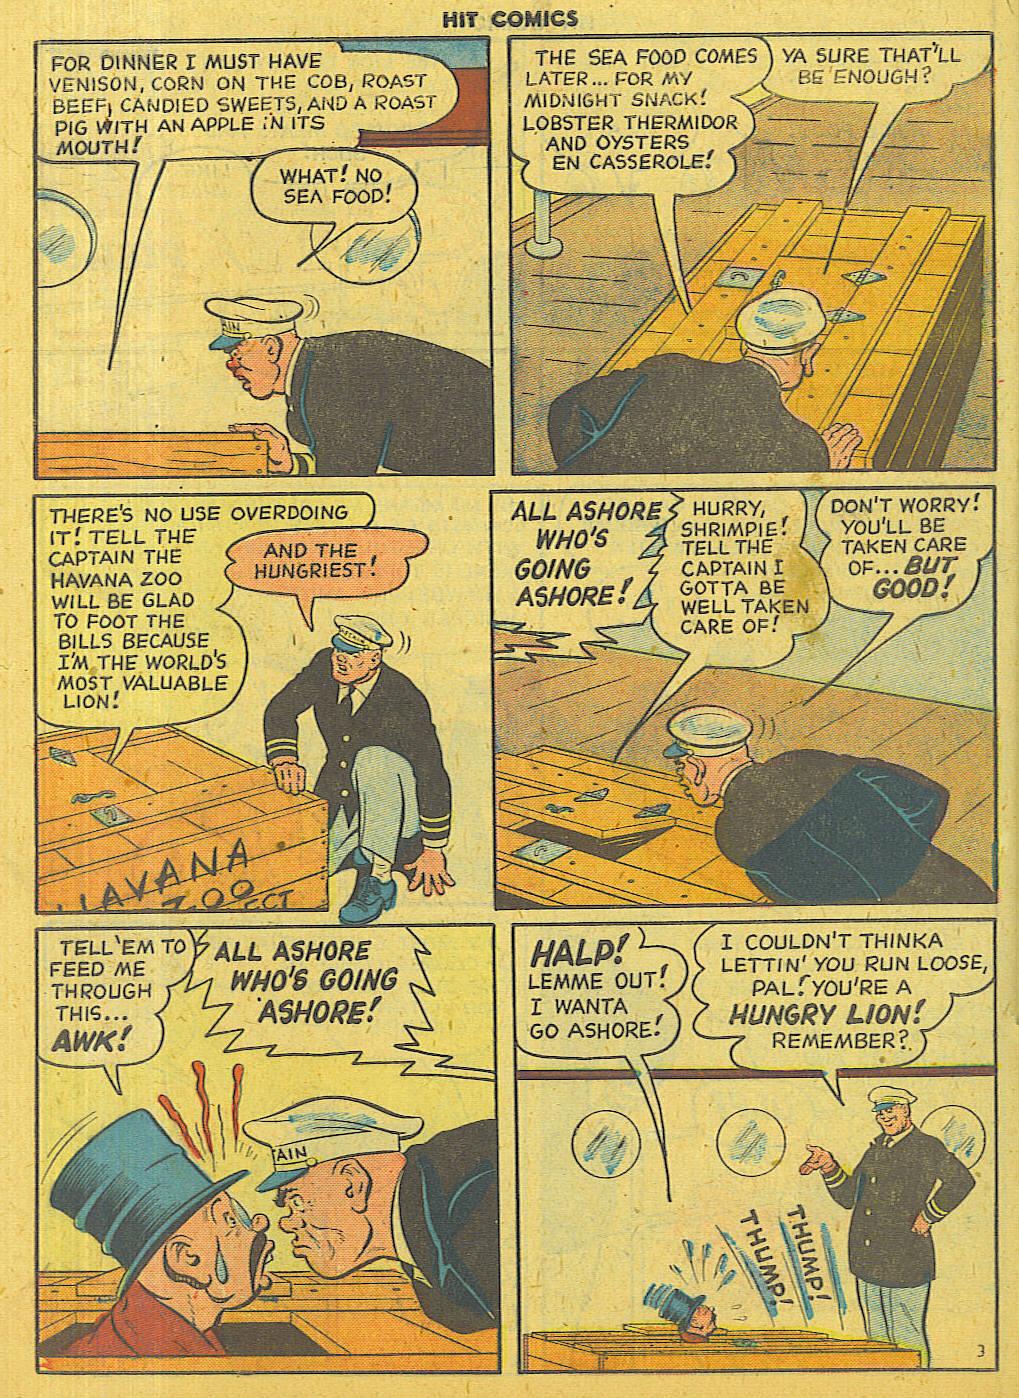 Read online Hit Comics comic -  Issue #56 - 40